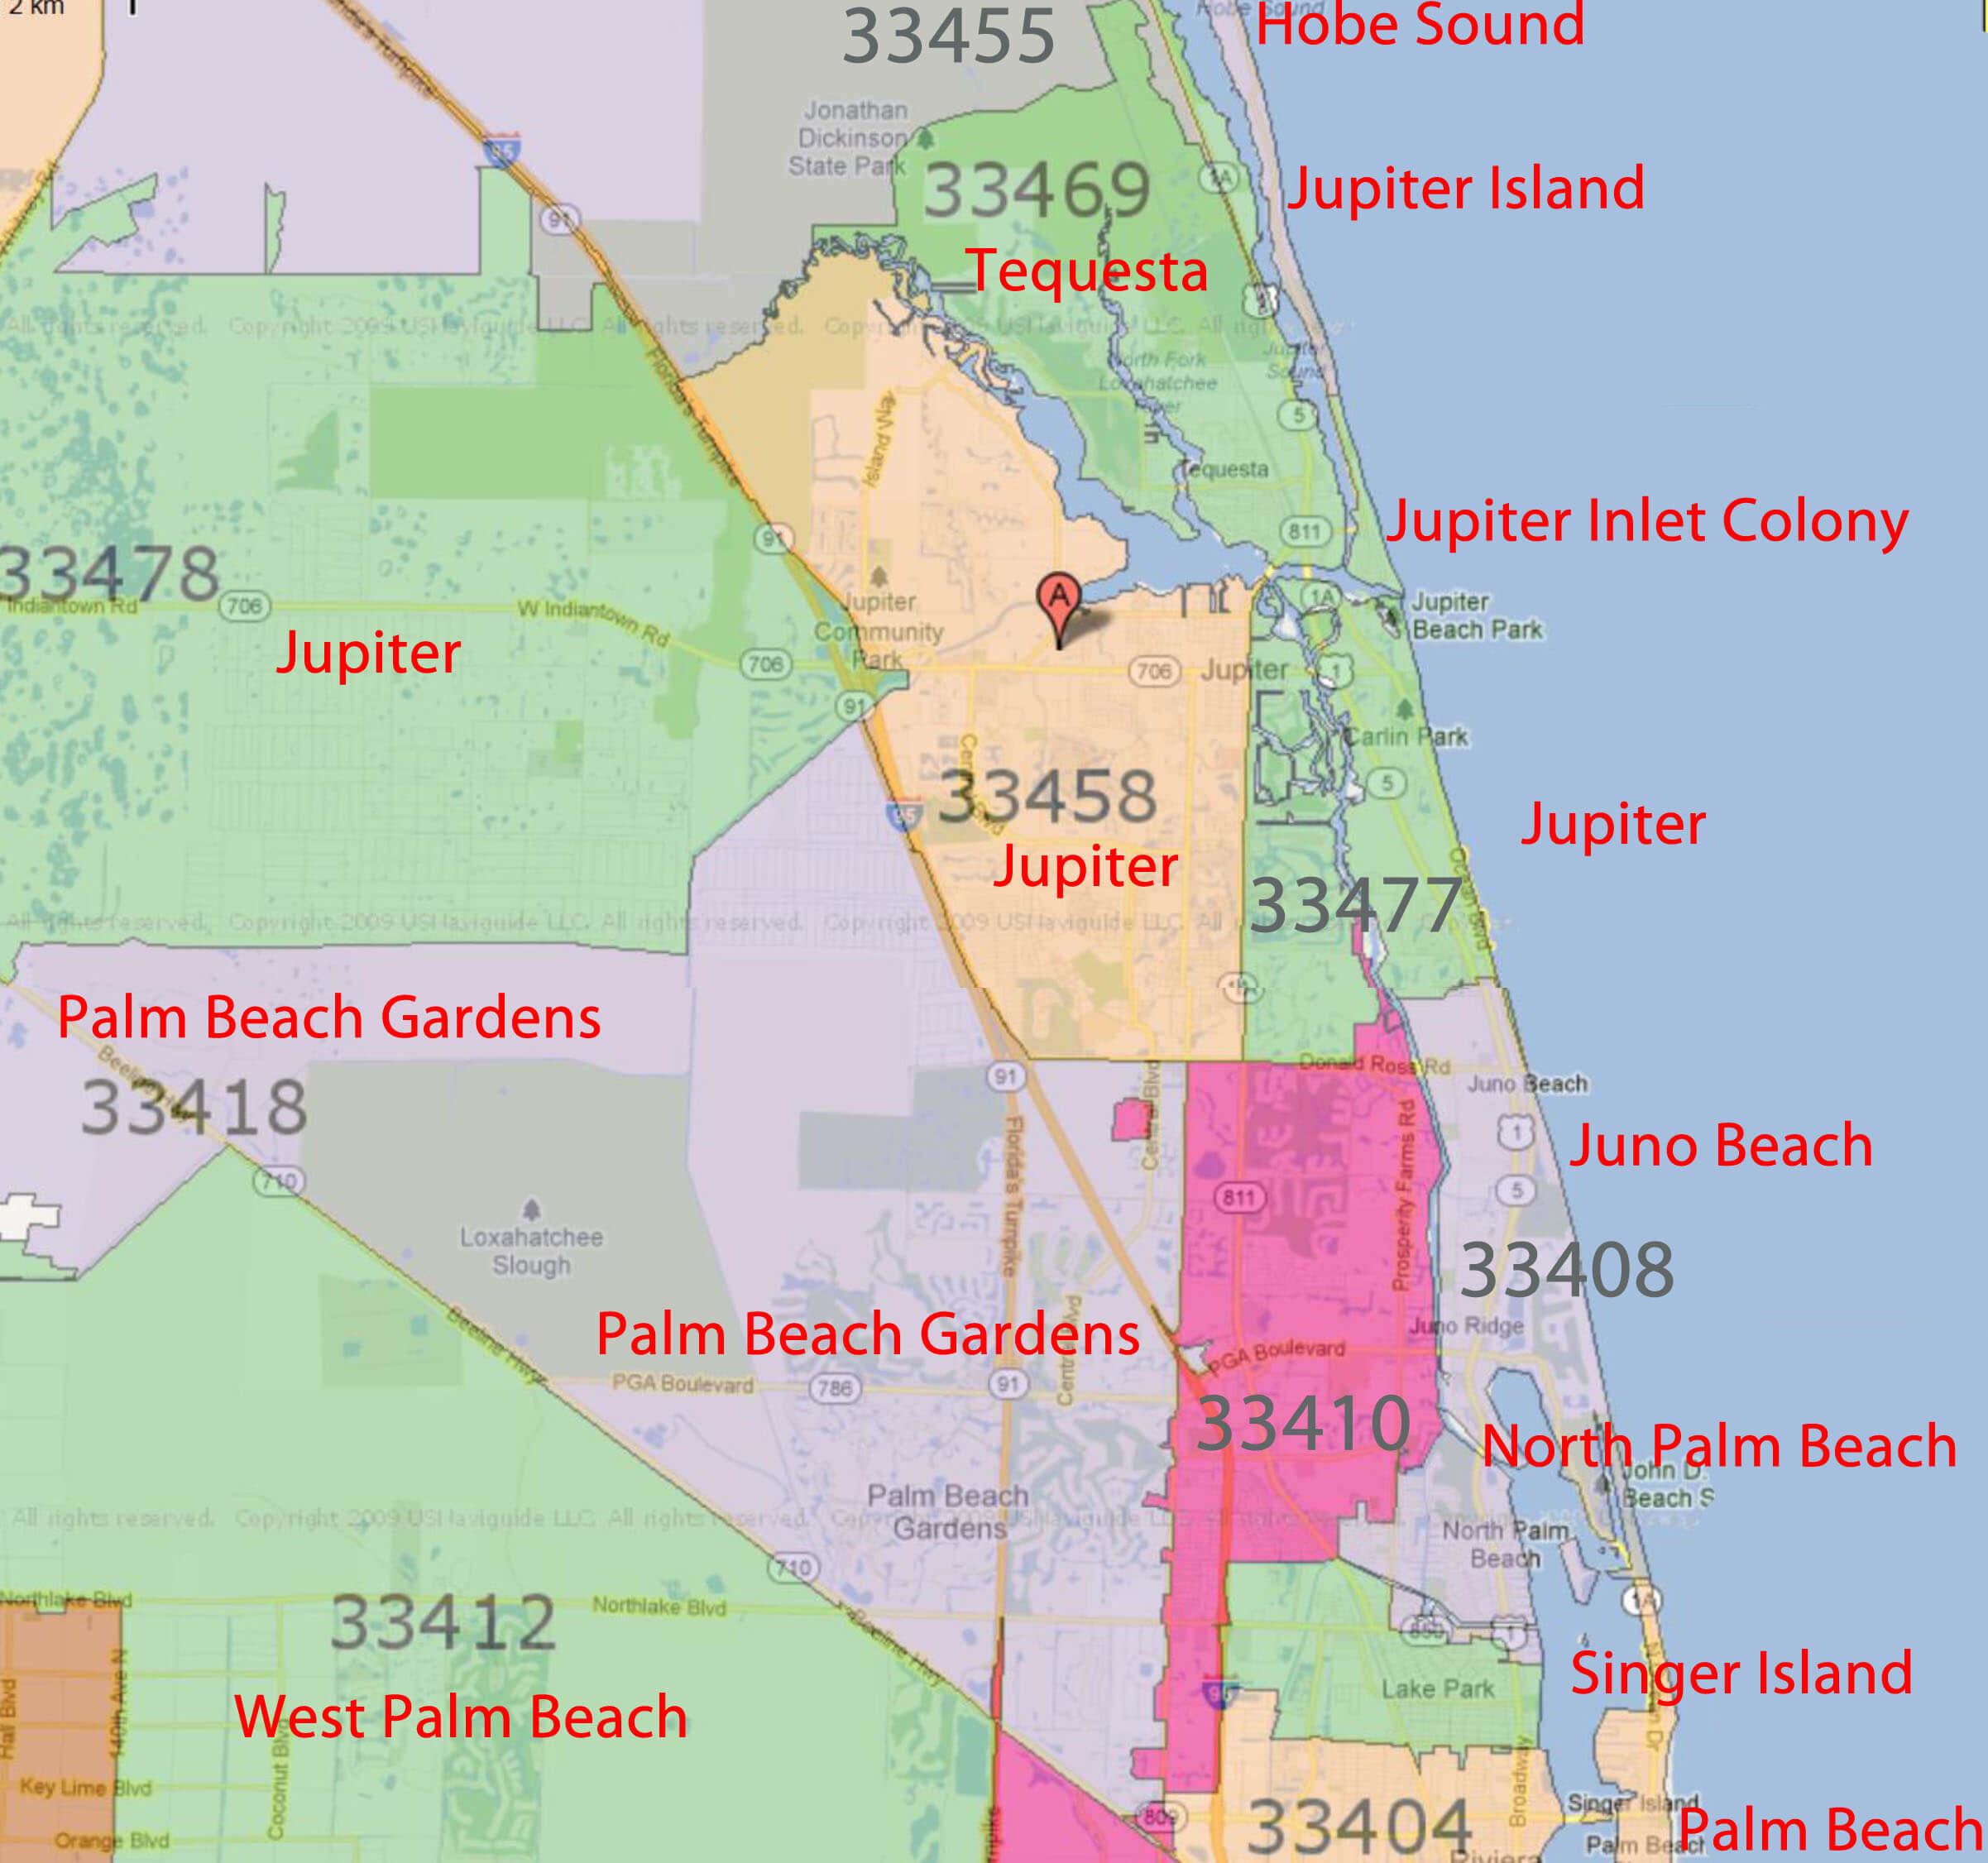 Palm Beach Gardens, Jupiter Florida Real Estatezip Code - Jupiter Island Florida Map